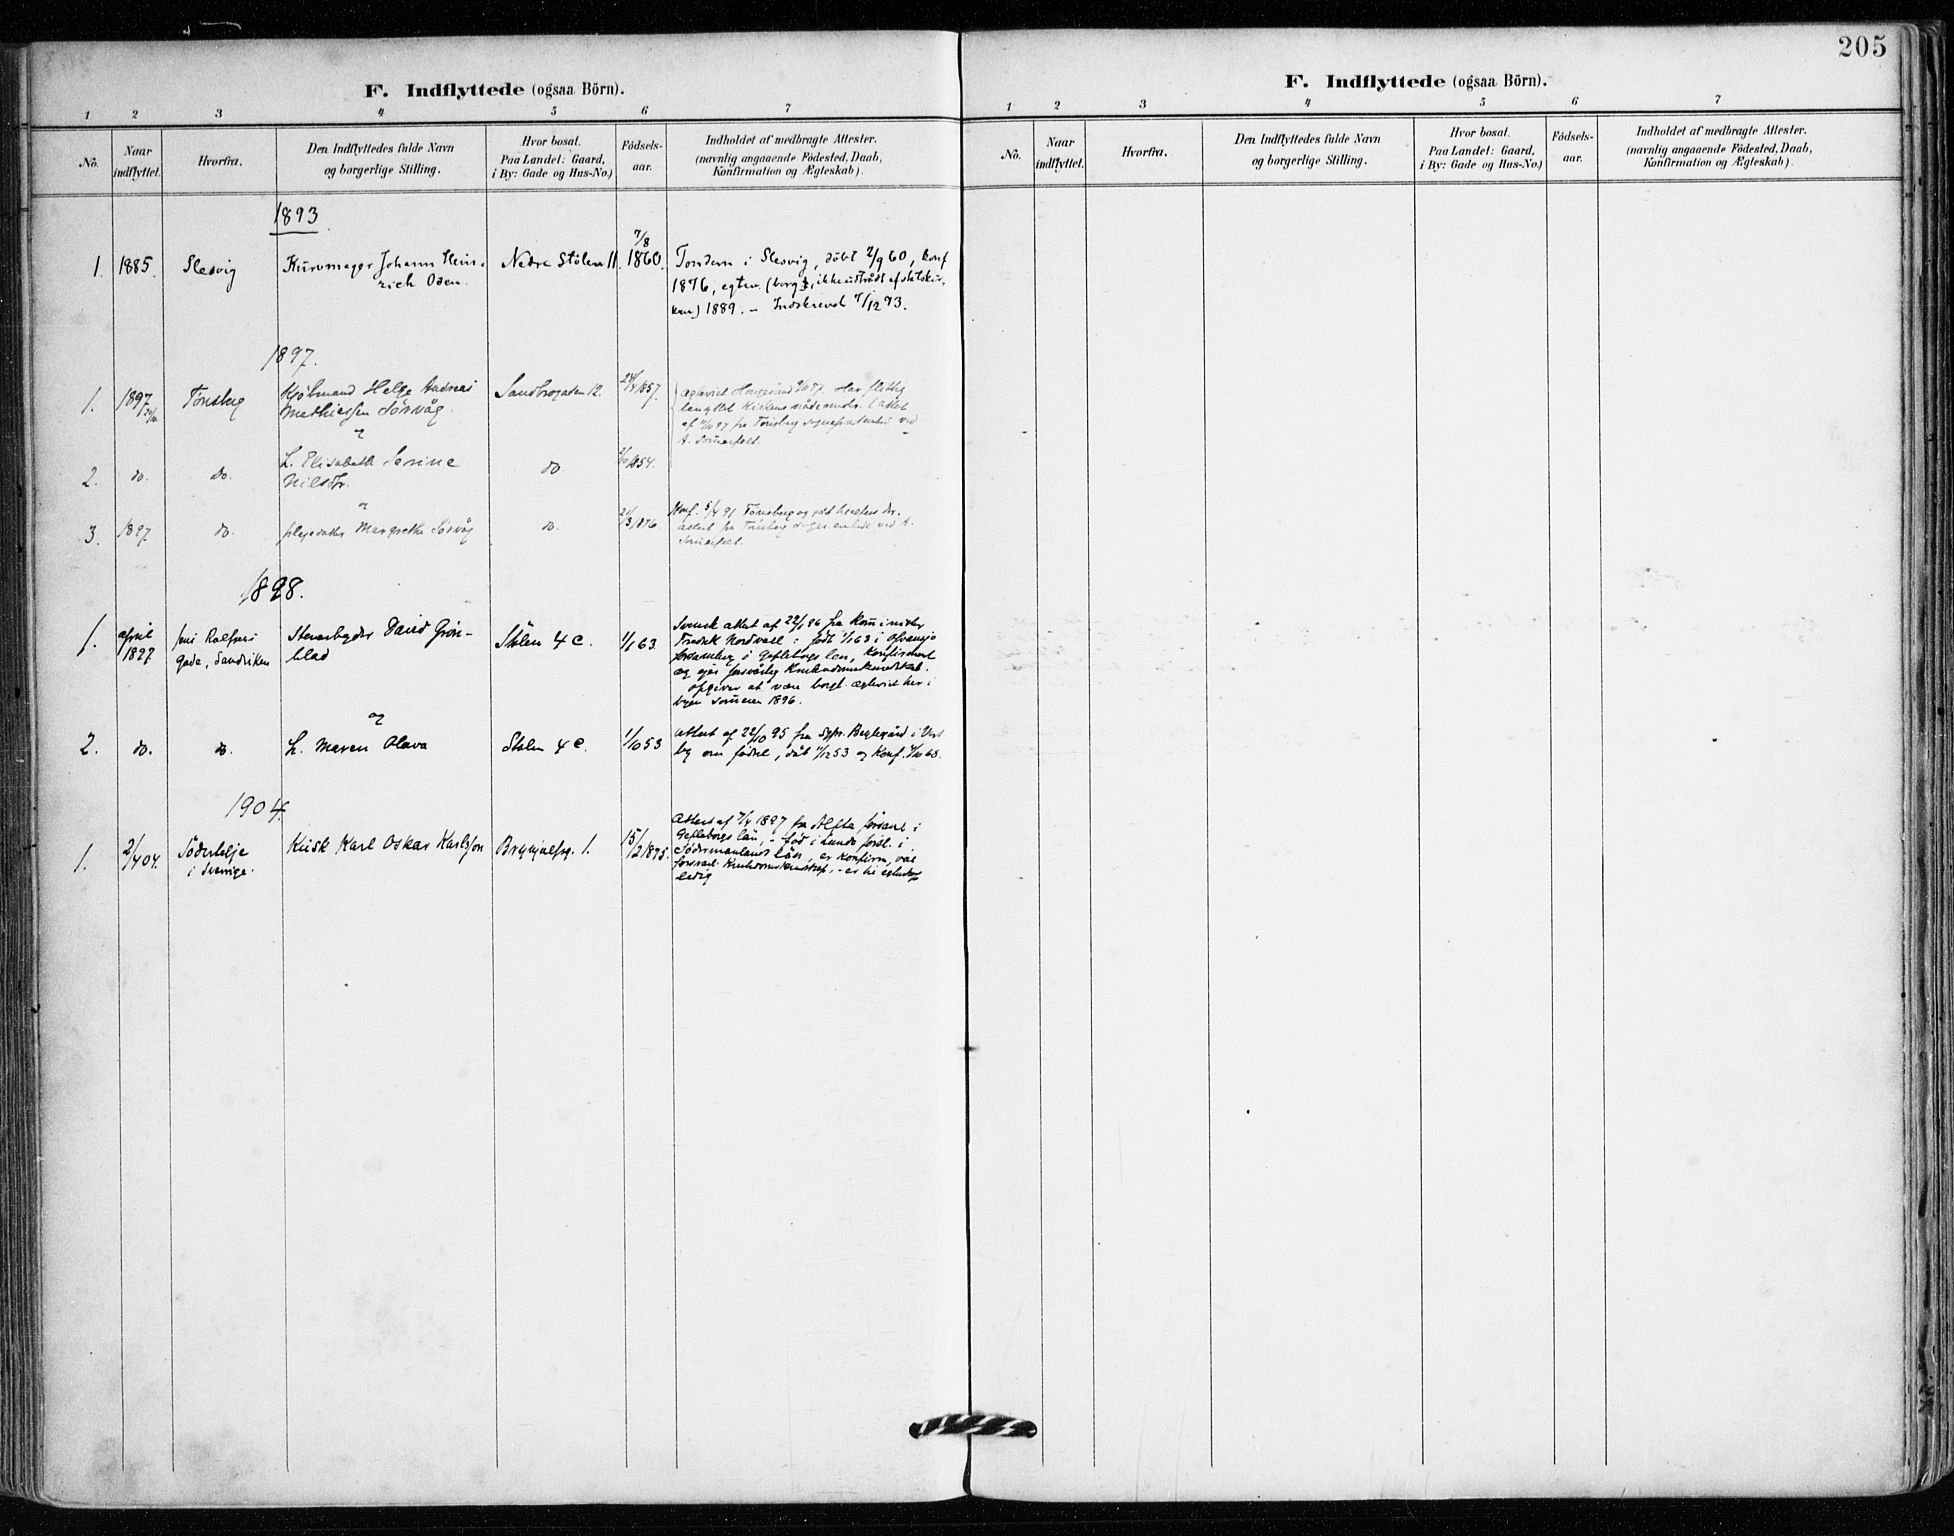 SAB, Mariakirken Sokneprestembete, H/Haa/L0008: Ministerialbok nr. A 8, 1893-1942, s. 205